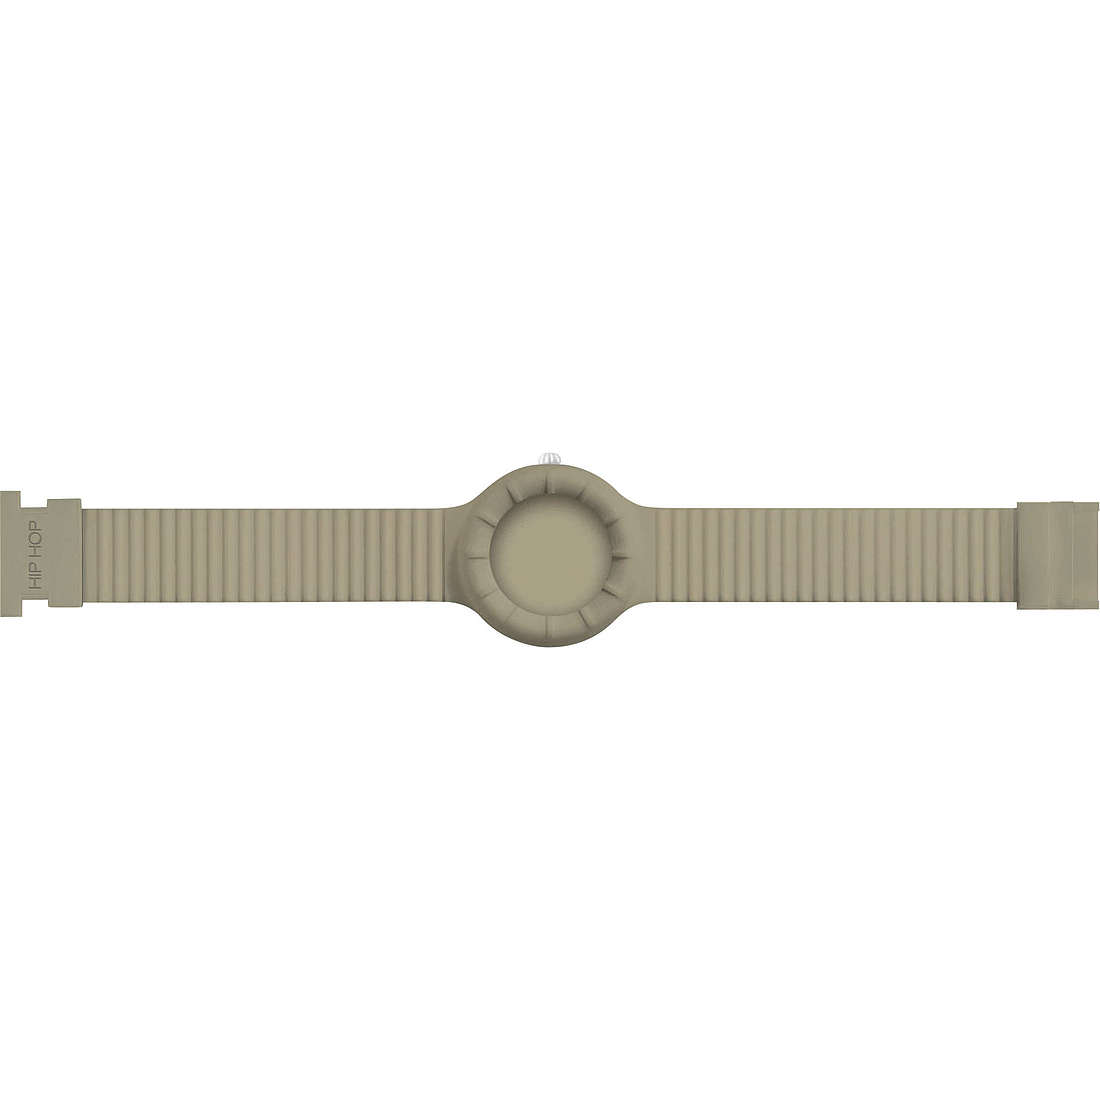 orologio accessorio unisex Hip Hop Studs HBU0236